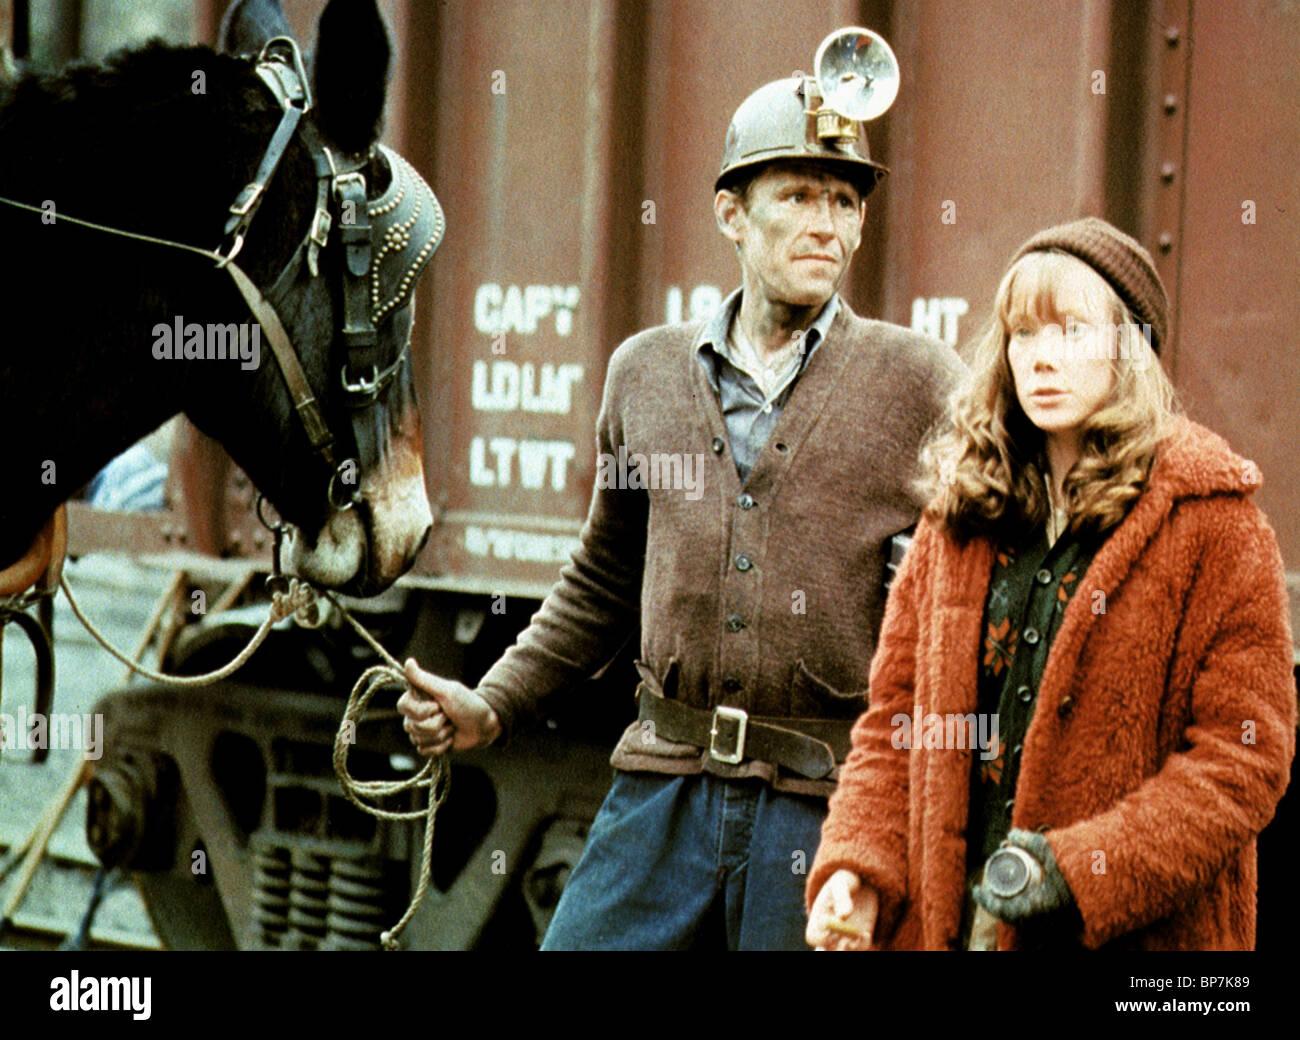 blu coal miners daughter - HD1300×1040